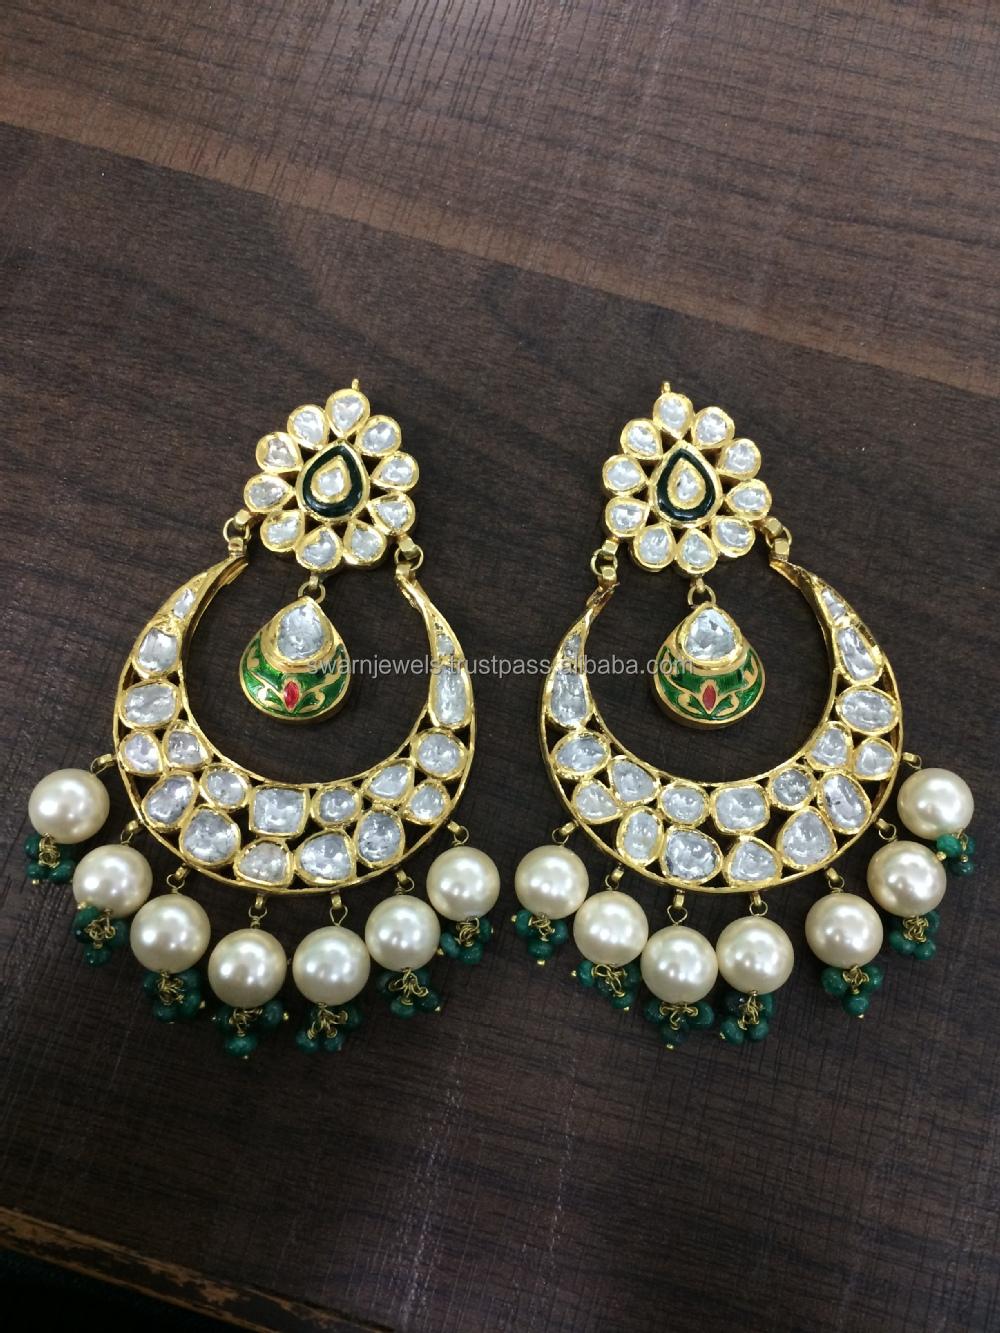 8867318a57df5 22K Gold Diamond Polki Designer Kundan Danglers with Pearl dropings, View  diamond long earrings, SWARN JEWELS Product Details from SWARN JEWELS on ...